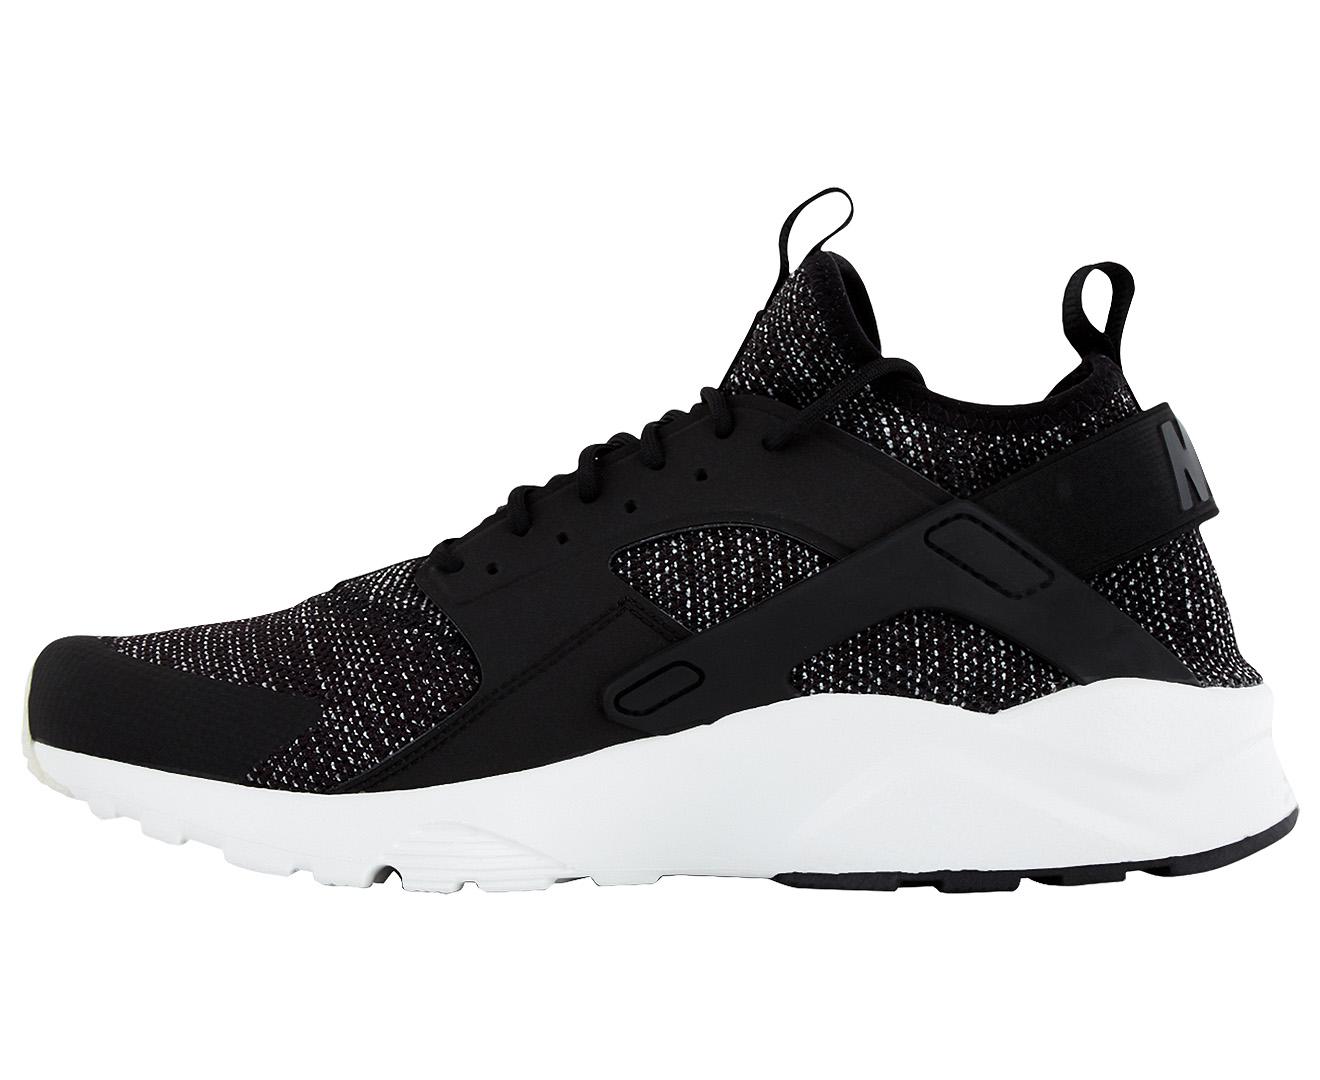 new concept f2457 0da54 Nike Men s Air Huarache Run Ultra Breathe Shoe - Black Black-Summit White    Scoopon Shopping